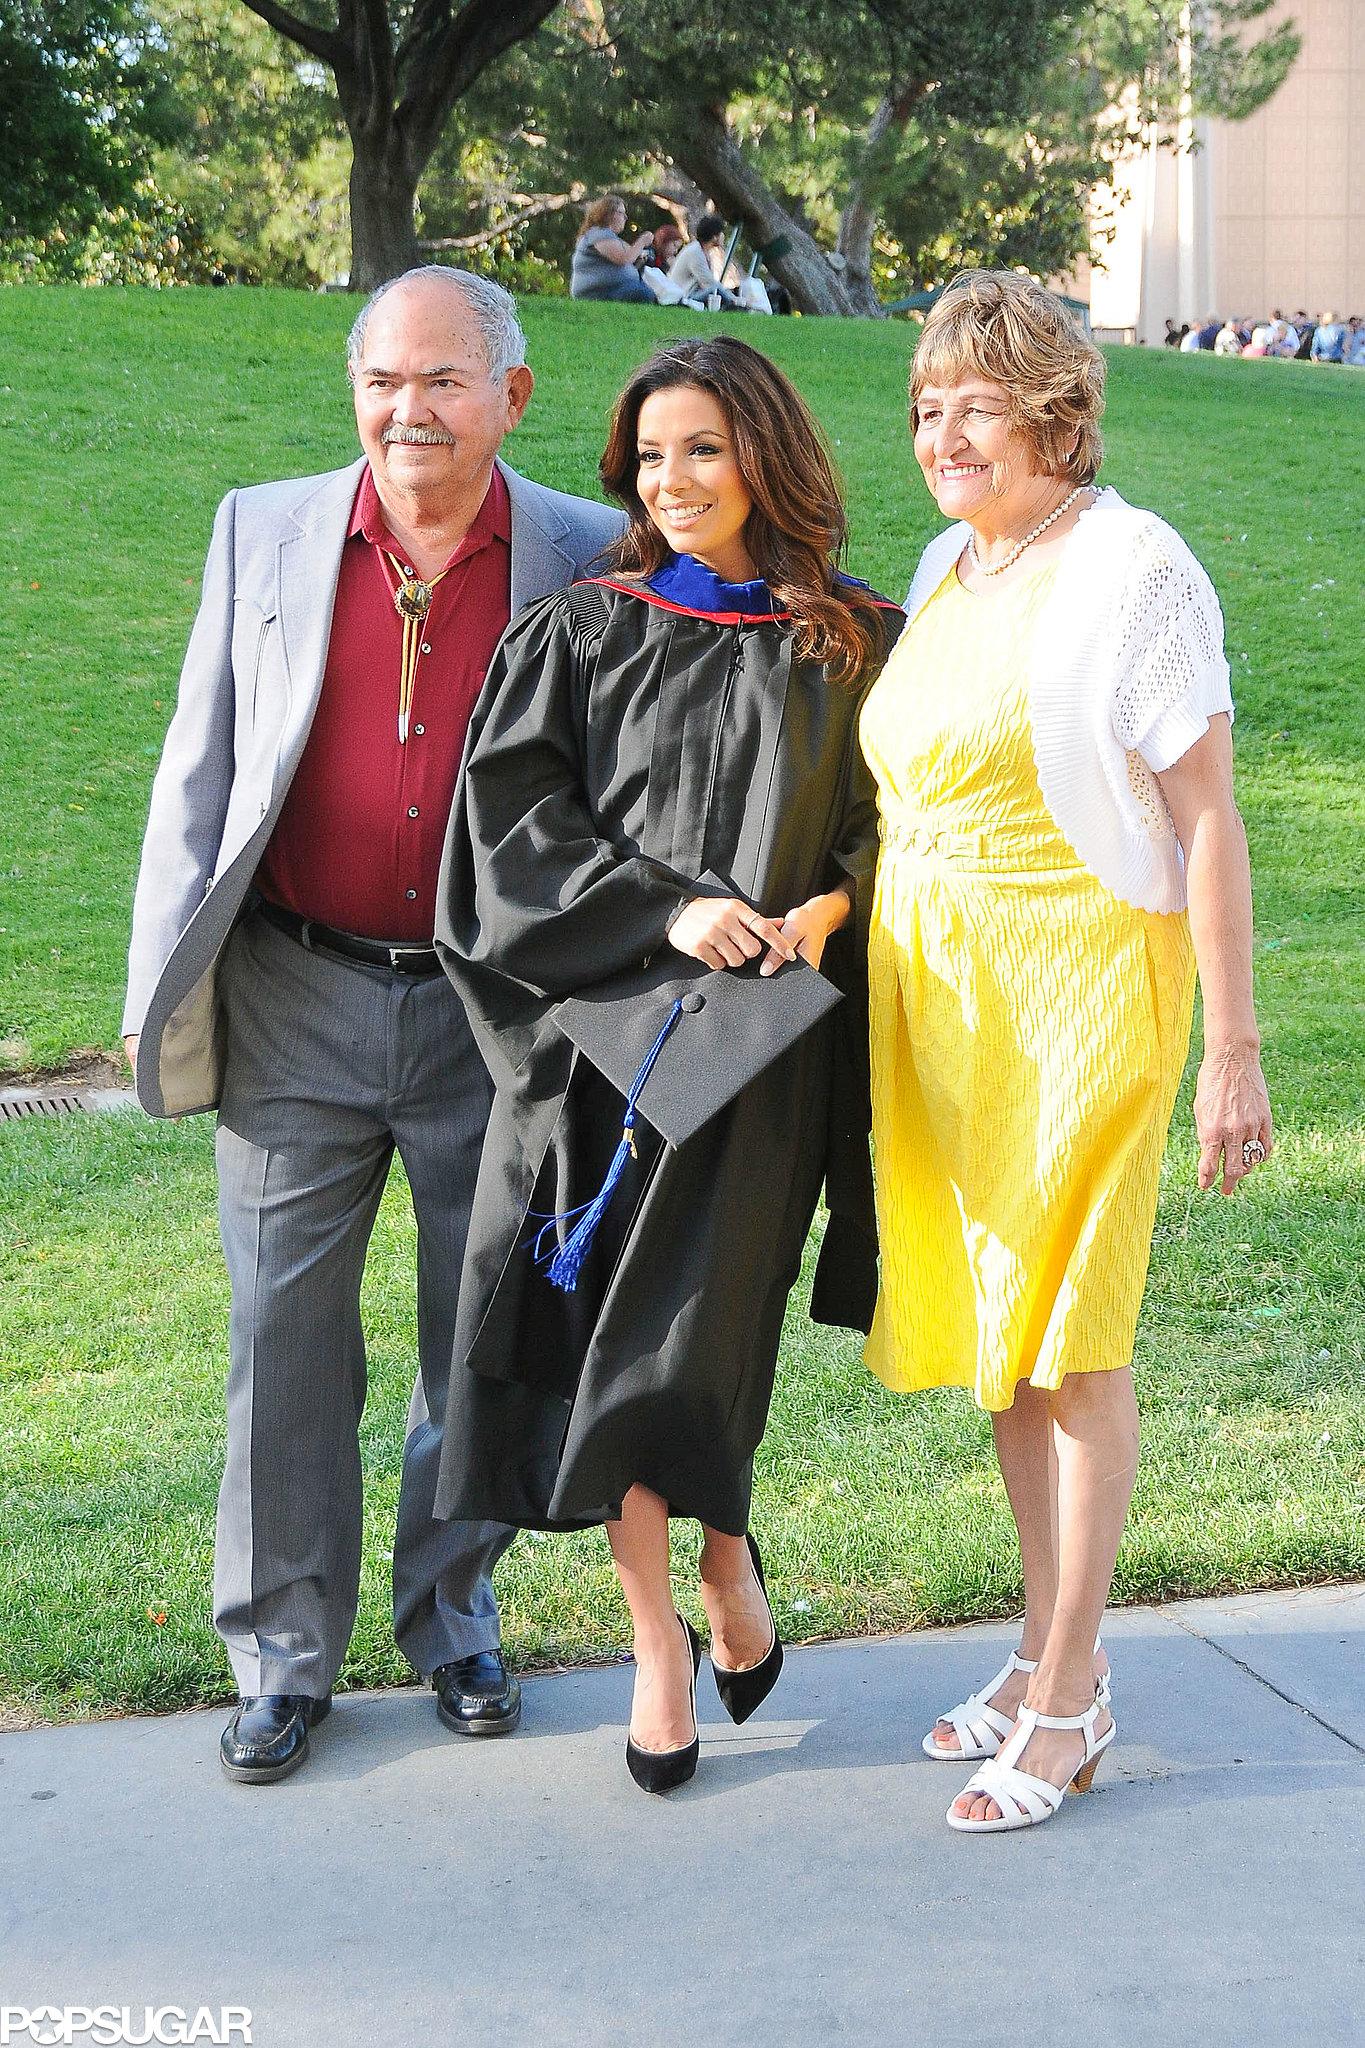 Eva Longoria had the support of her parents at her graduation.